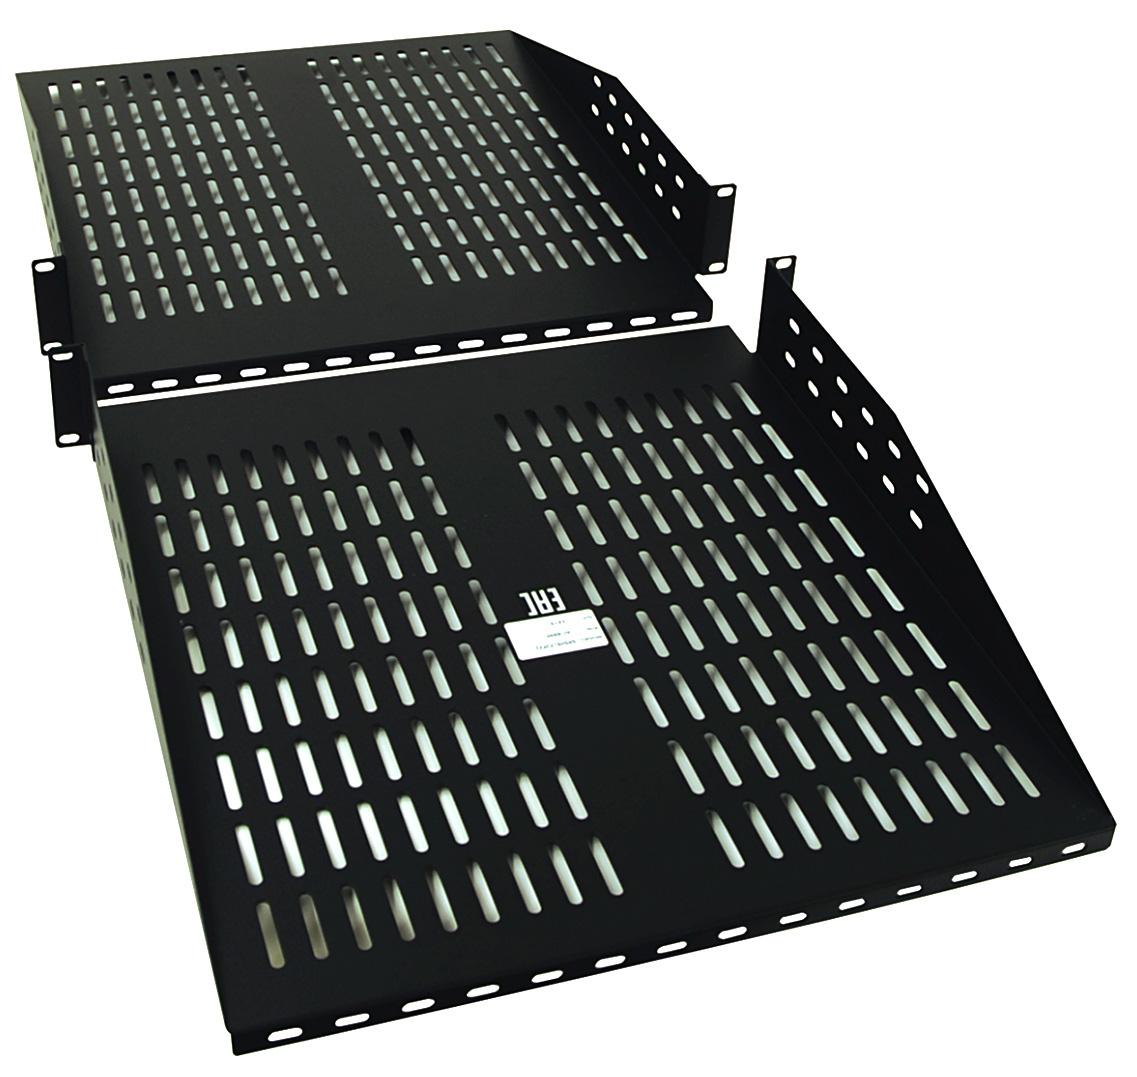 tripp lite srshelf2px2 rack cantilever fixed shelf 2 post. Black Bedroom Furniture Sets. Home Design Ideas